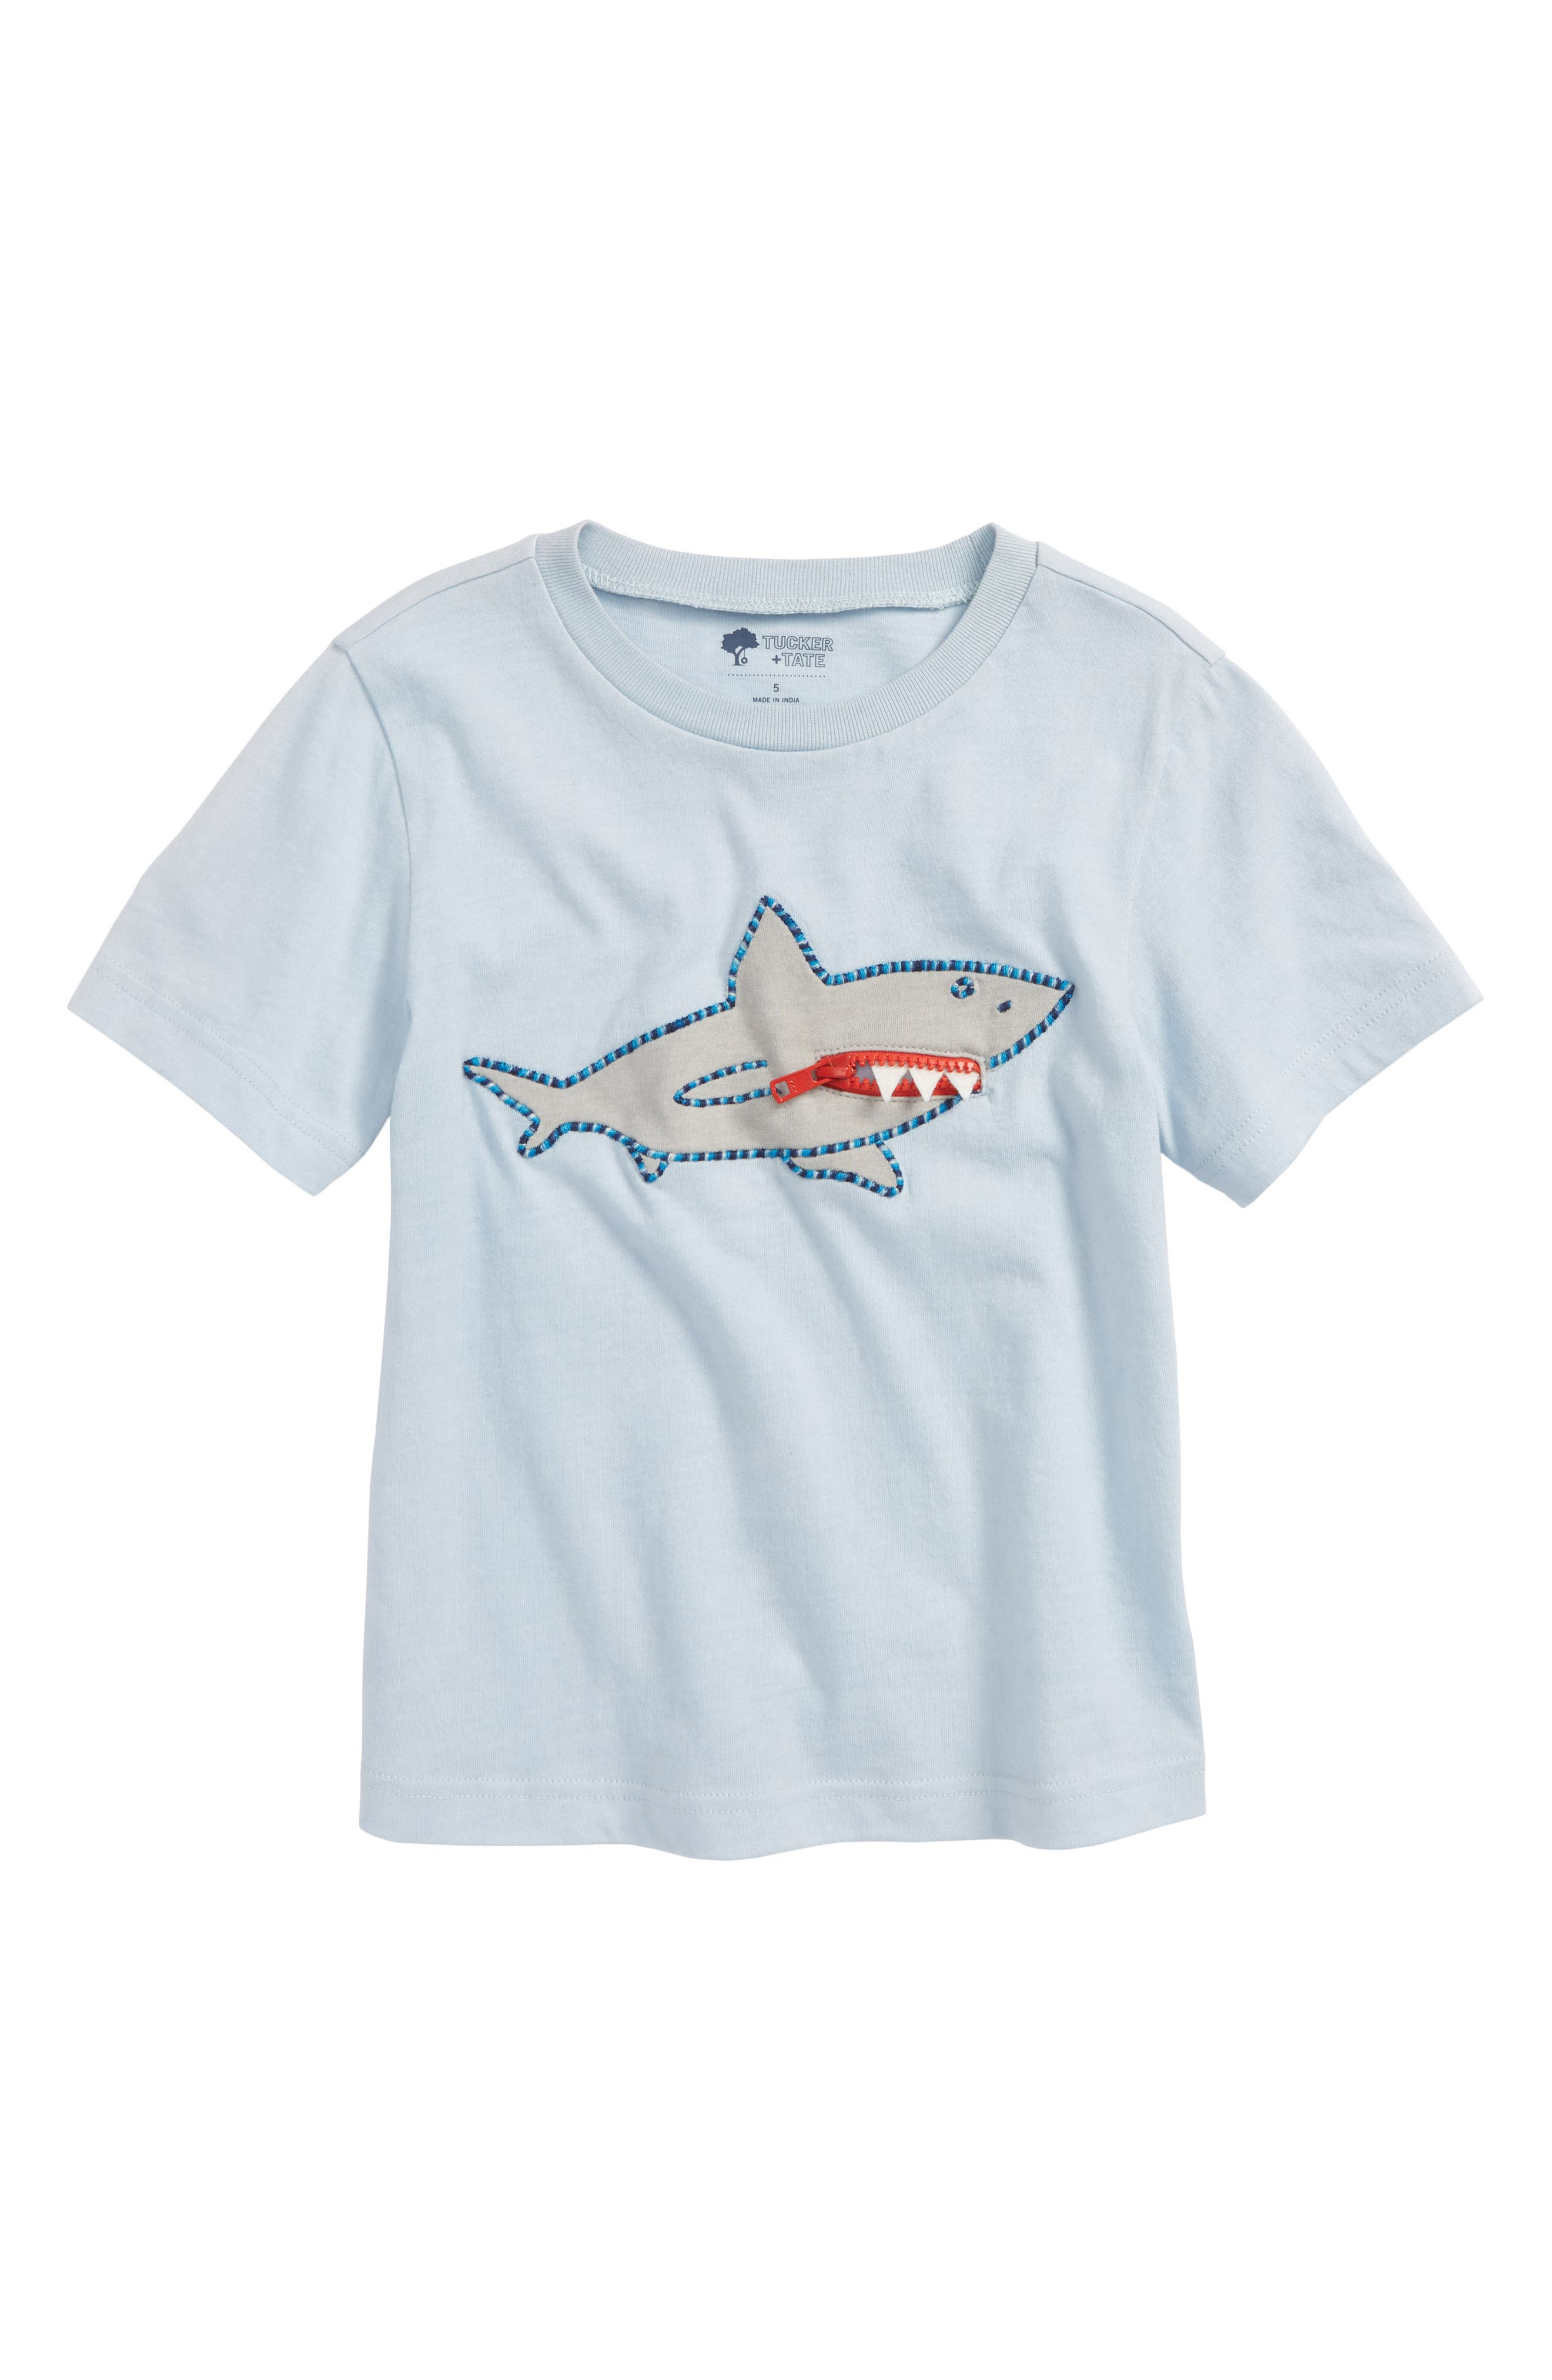 3D Graphic T-Shirt,                         Main,                         color, Blue Fog Shark